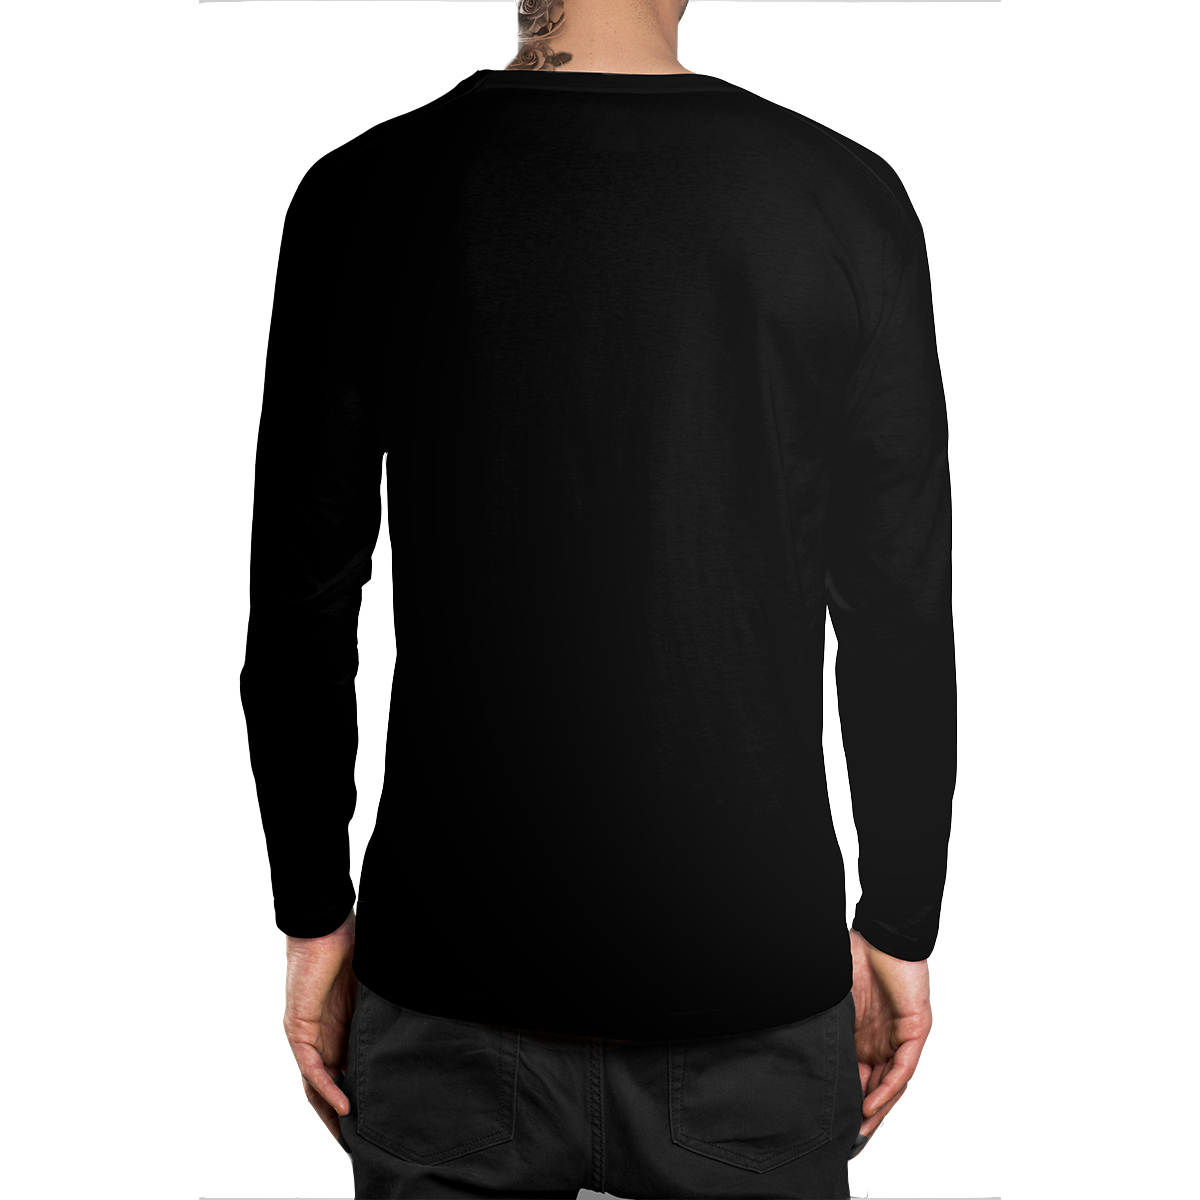 Stompy Camiseta Manga Longa Modelo 34